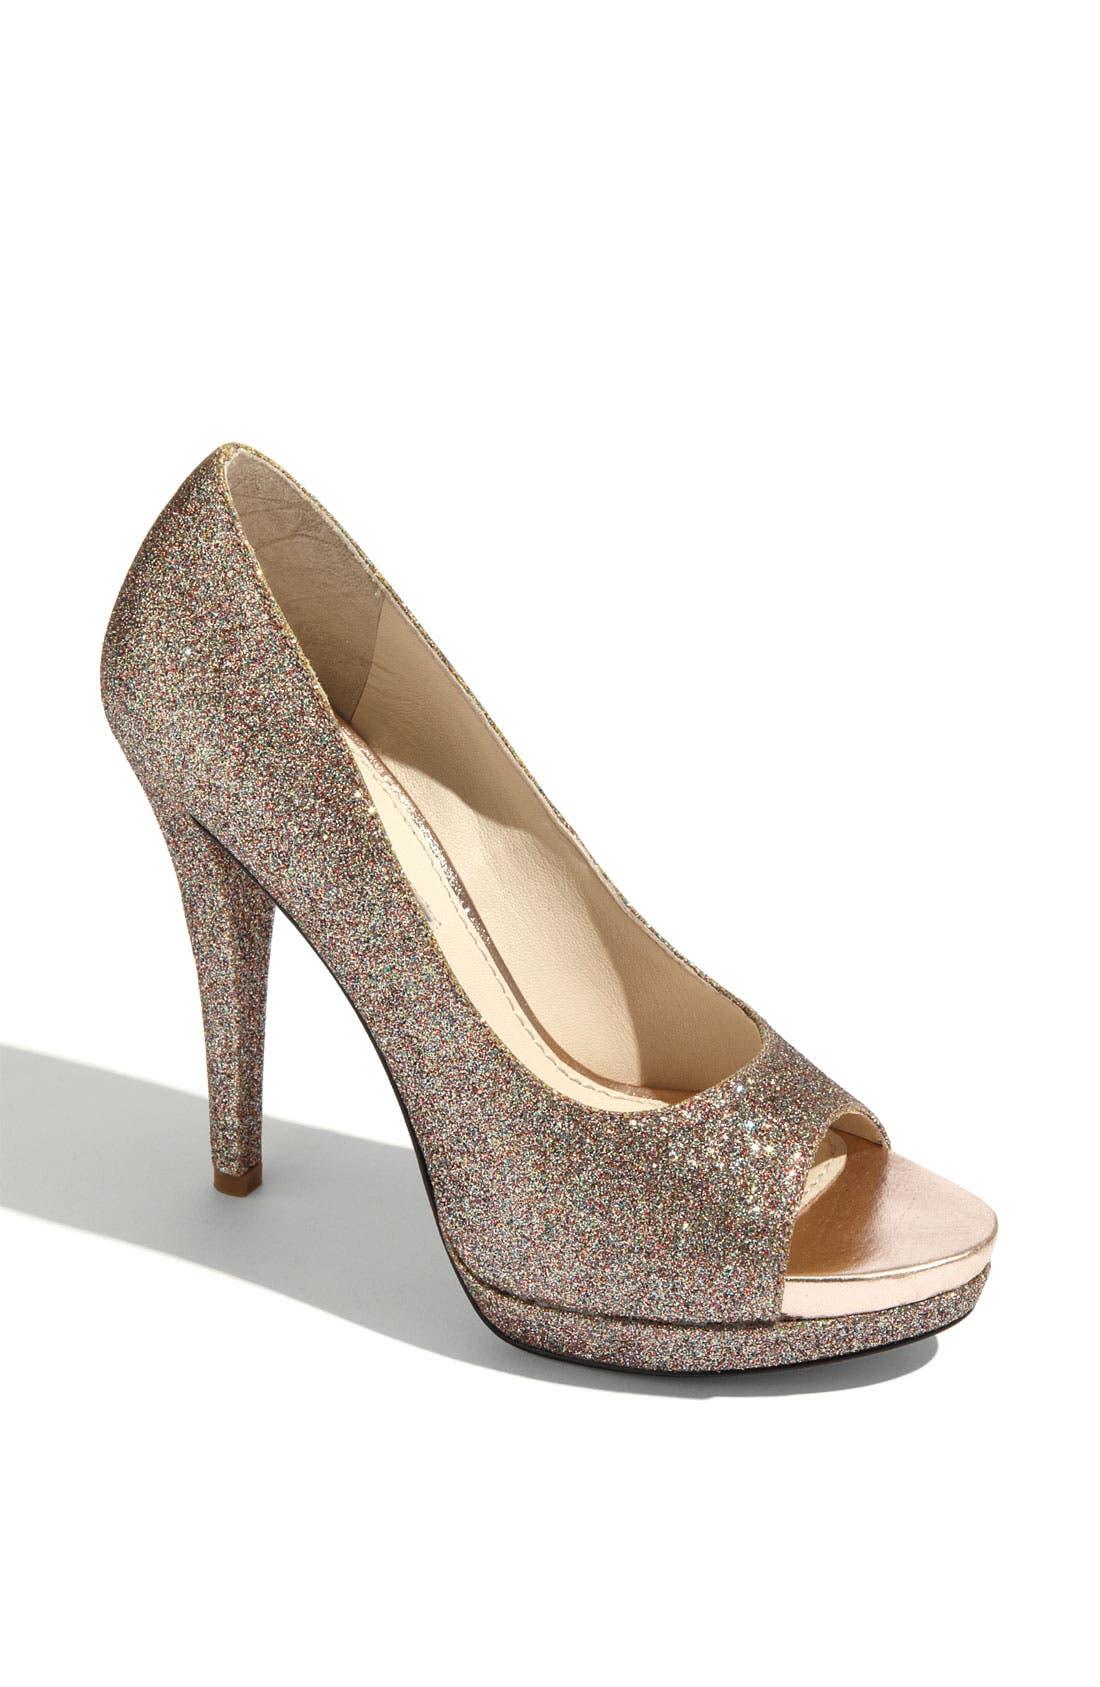 Footwear 'Selima' Peep Toe Pump,                             Main thumbnail 5, color,